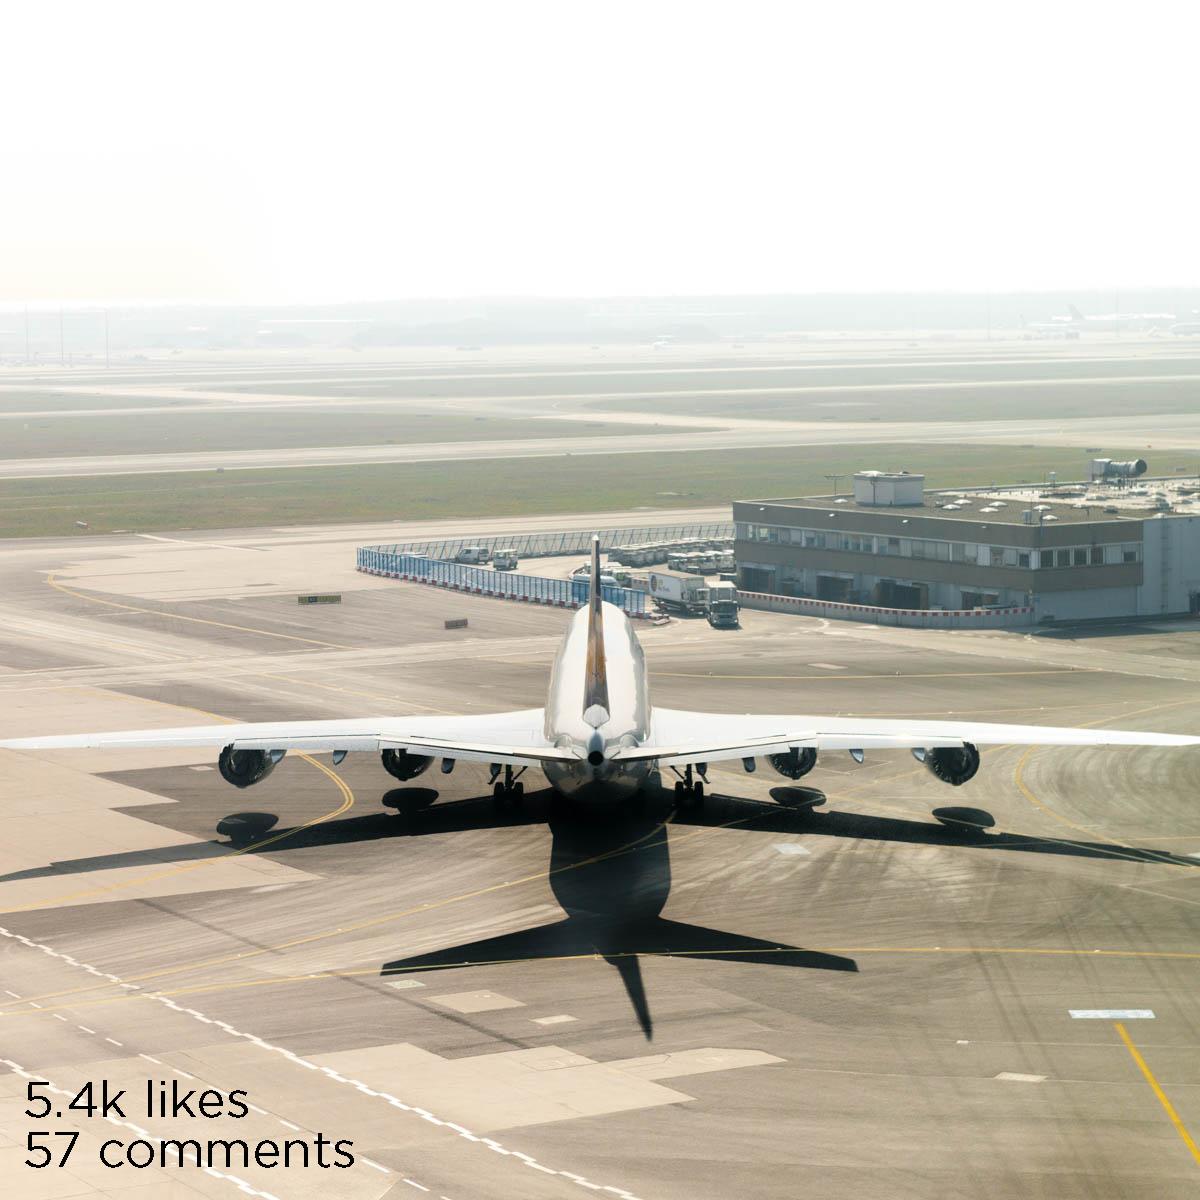 lh 747 shadow head on (1 of 1).jpg